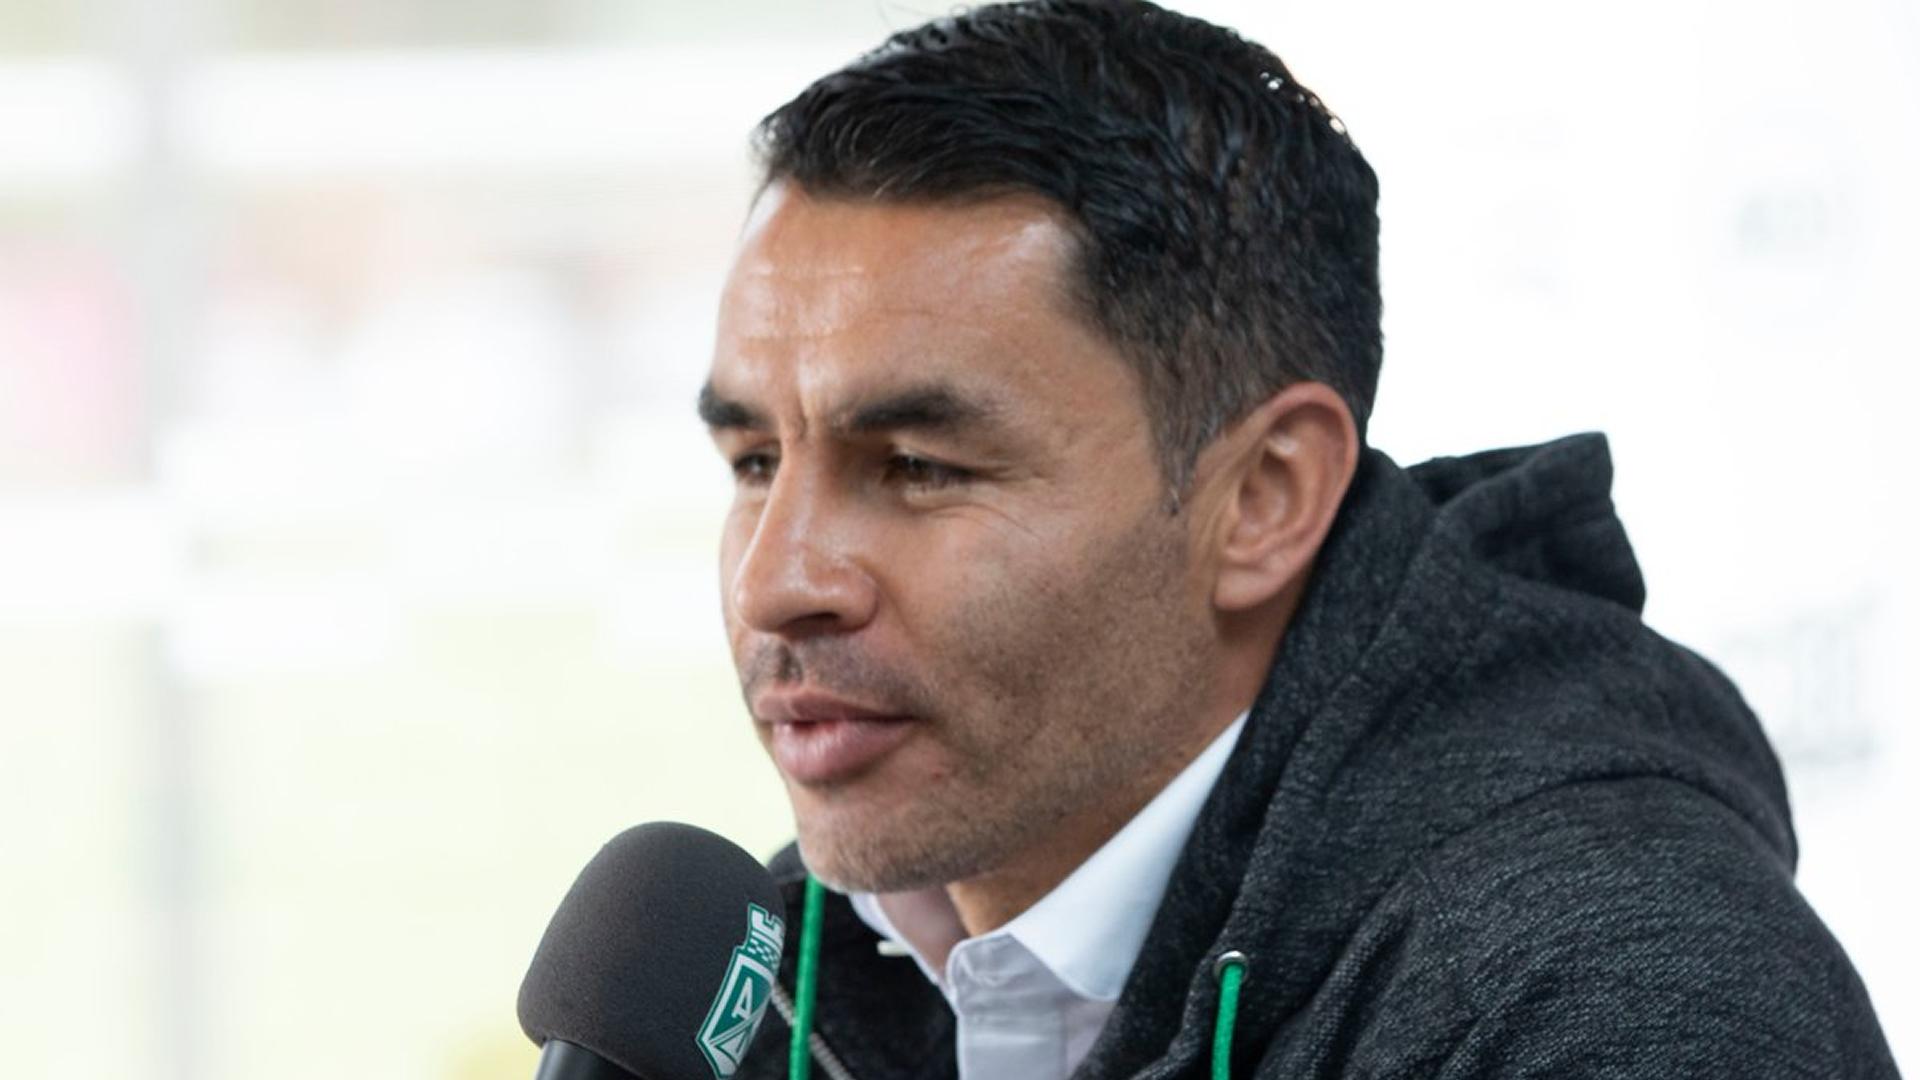 Francisco Nájera Atlético Nacional 2018